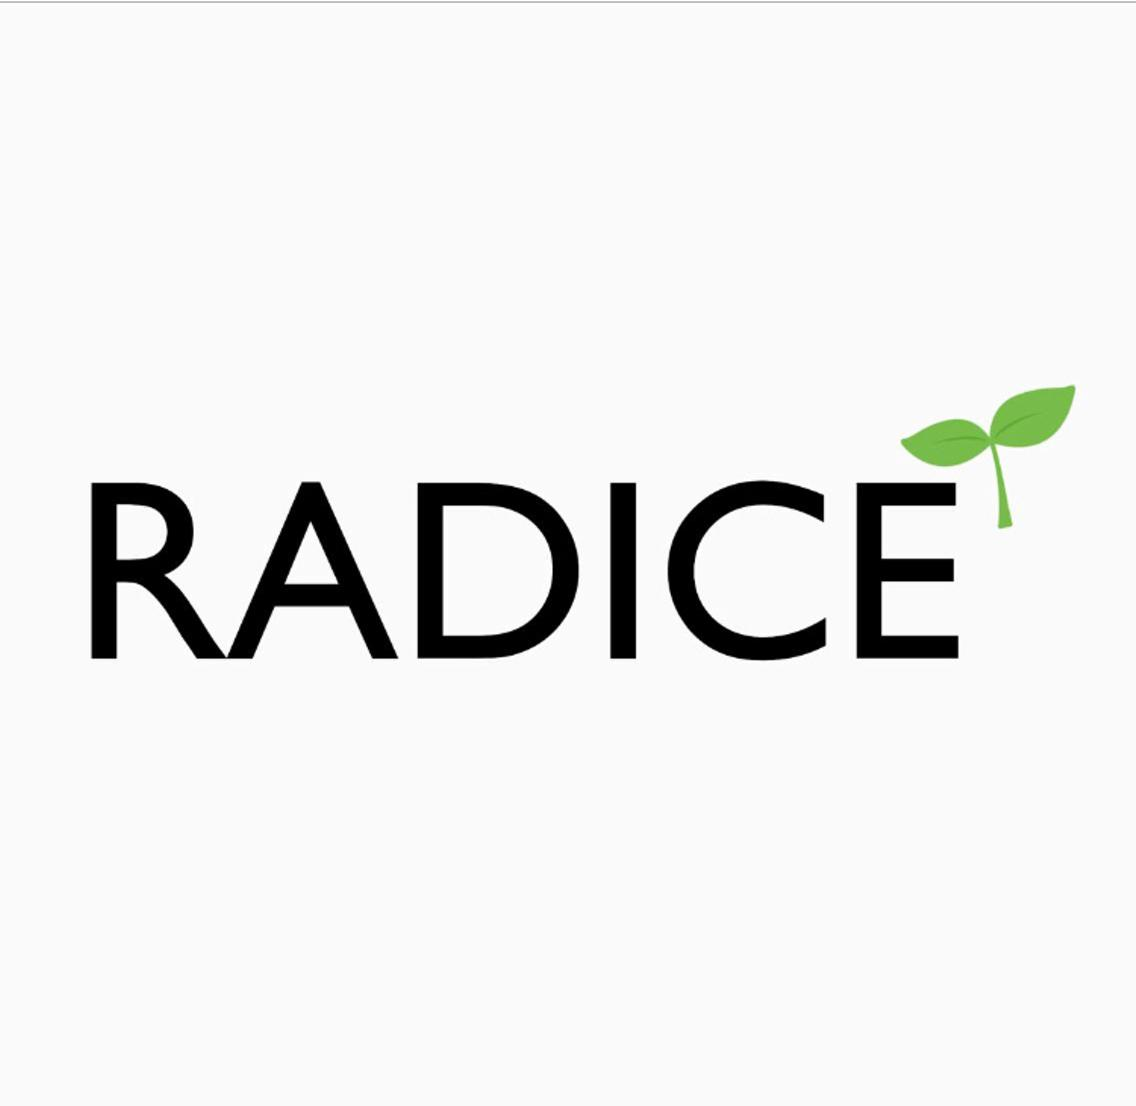 RADICE (ラディーチェ)愛美所属・美容整体師 Manamiの掲載